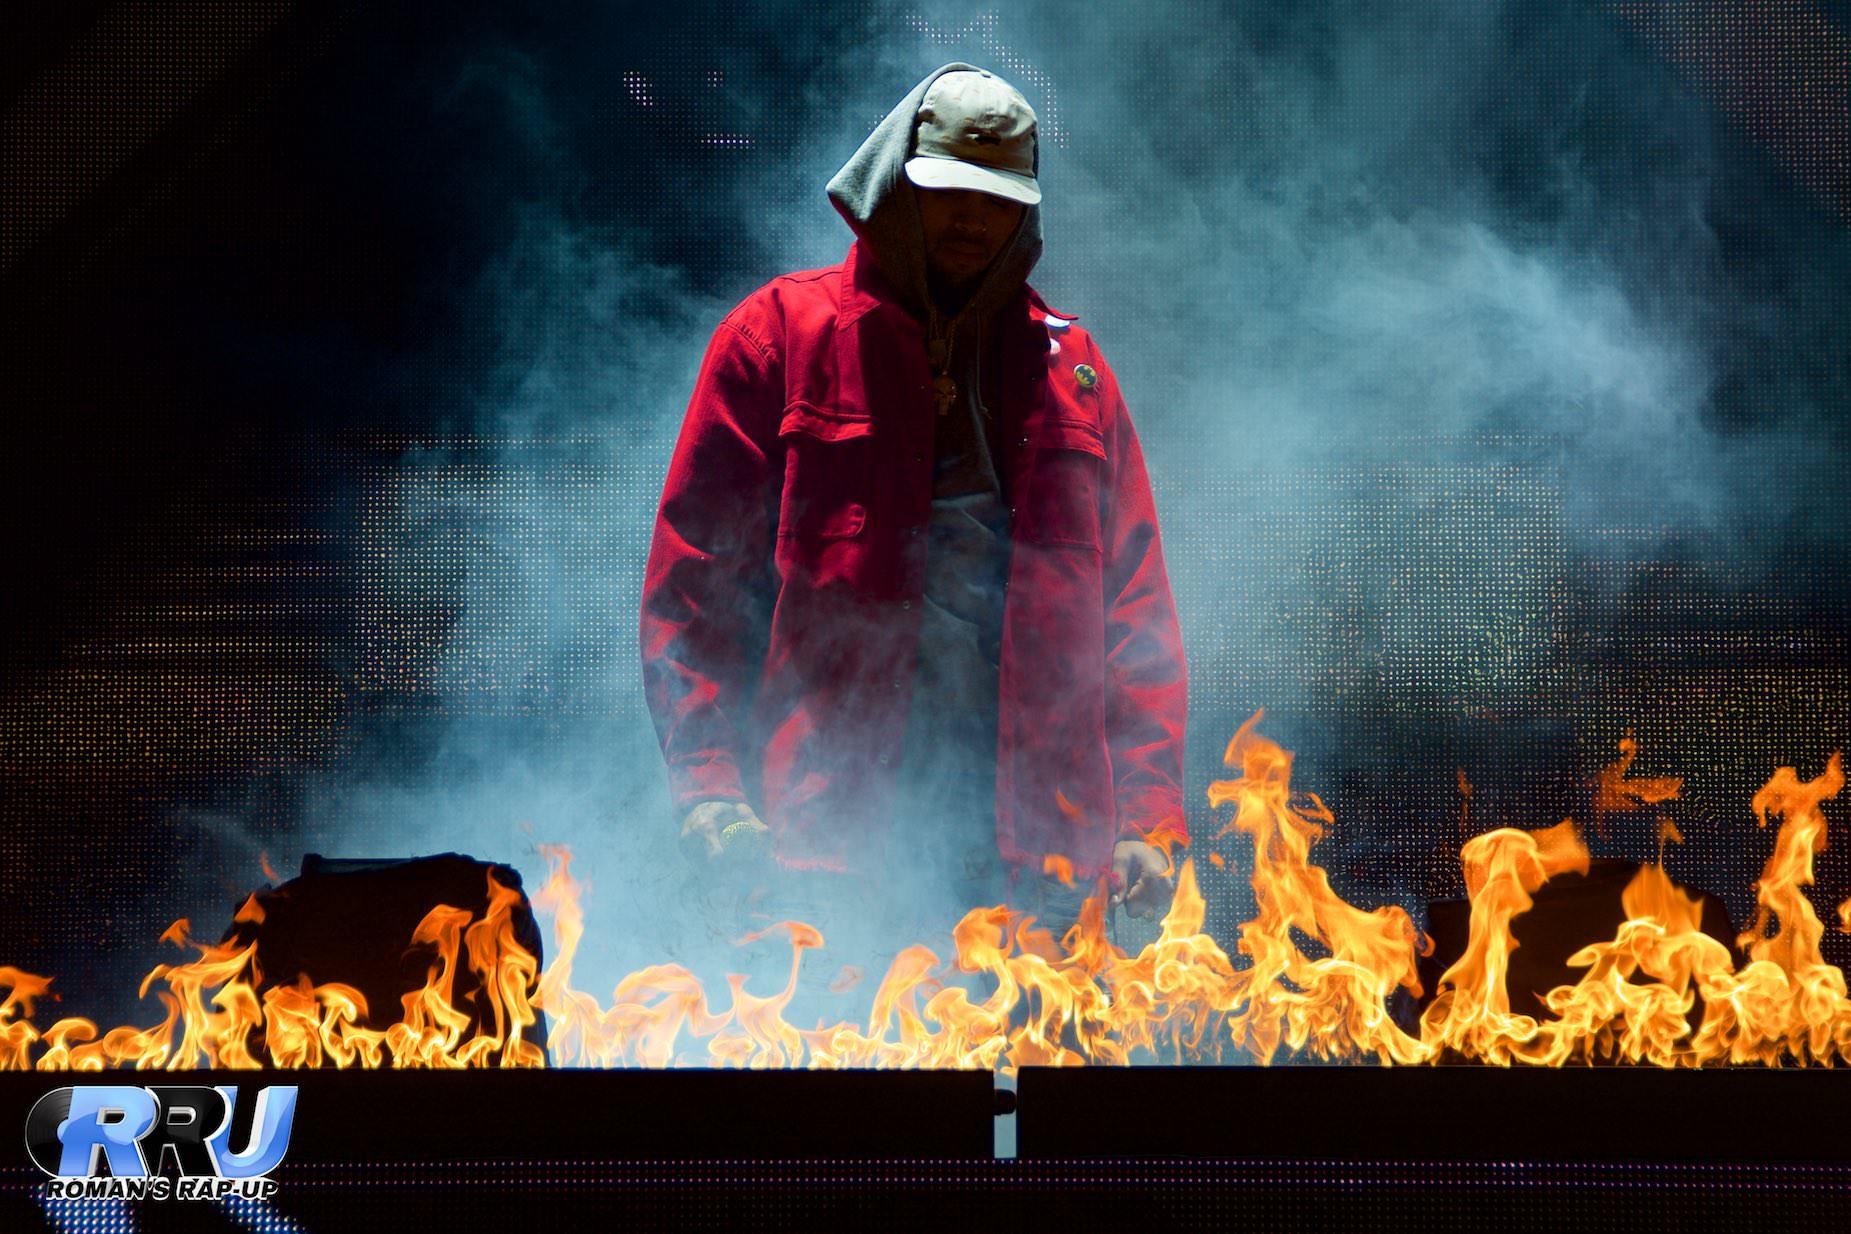 Chris Brown performing at the Xfinity Center on August 29th, 2015 (Benjamin Esakof/Roman's Rap-Up).